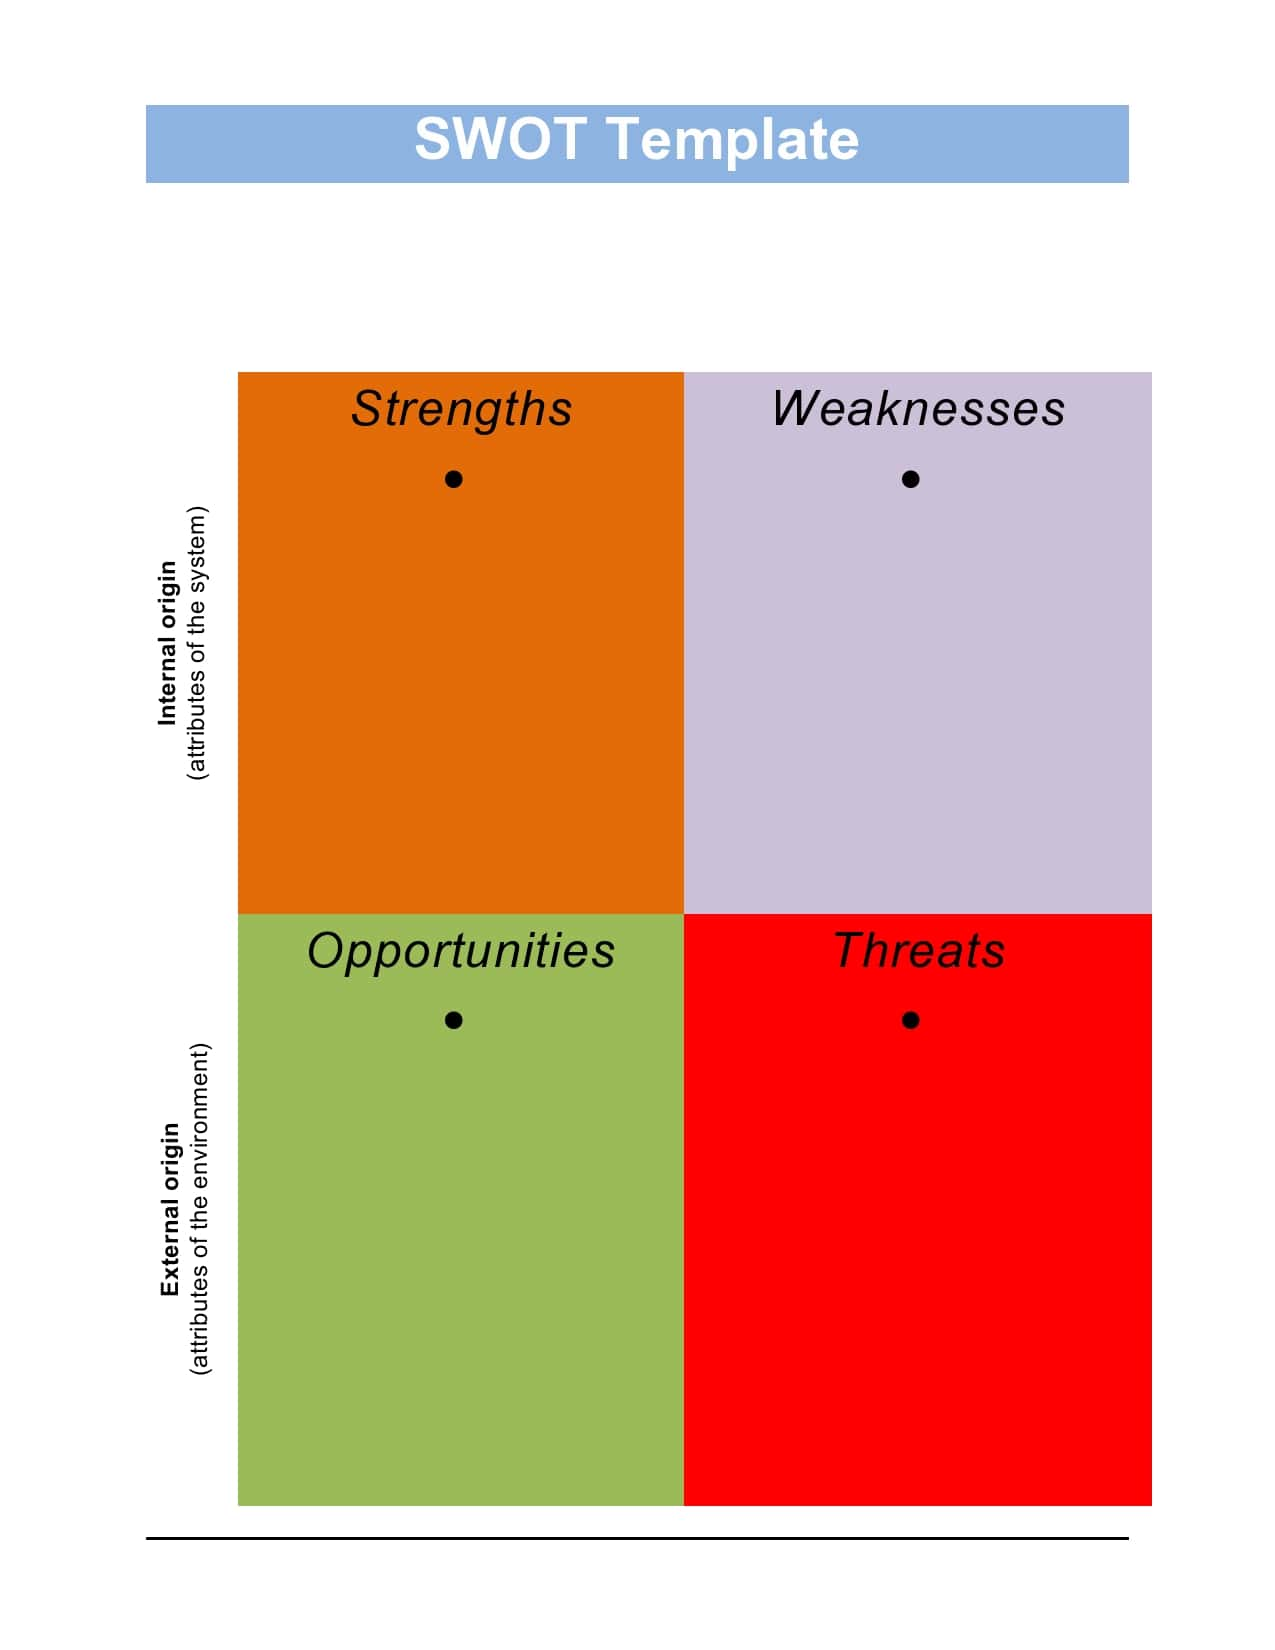 swot analysis template 13